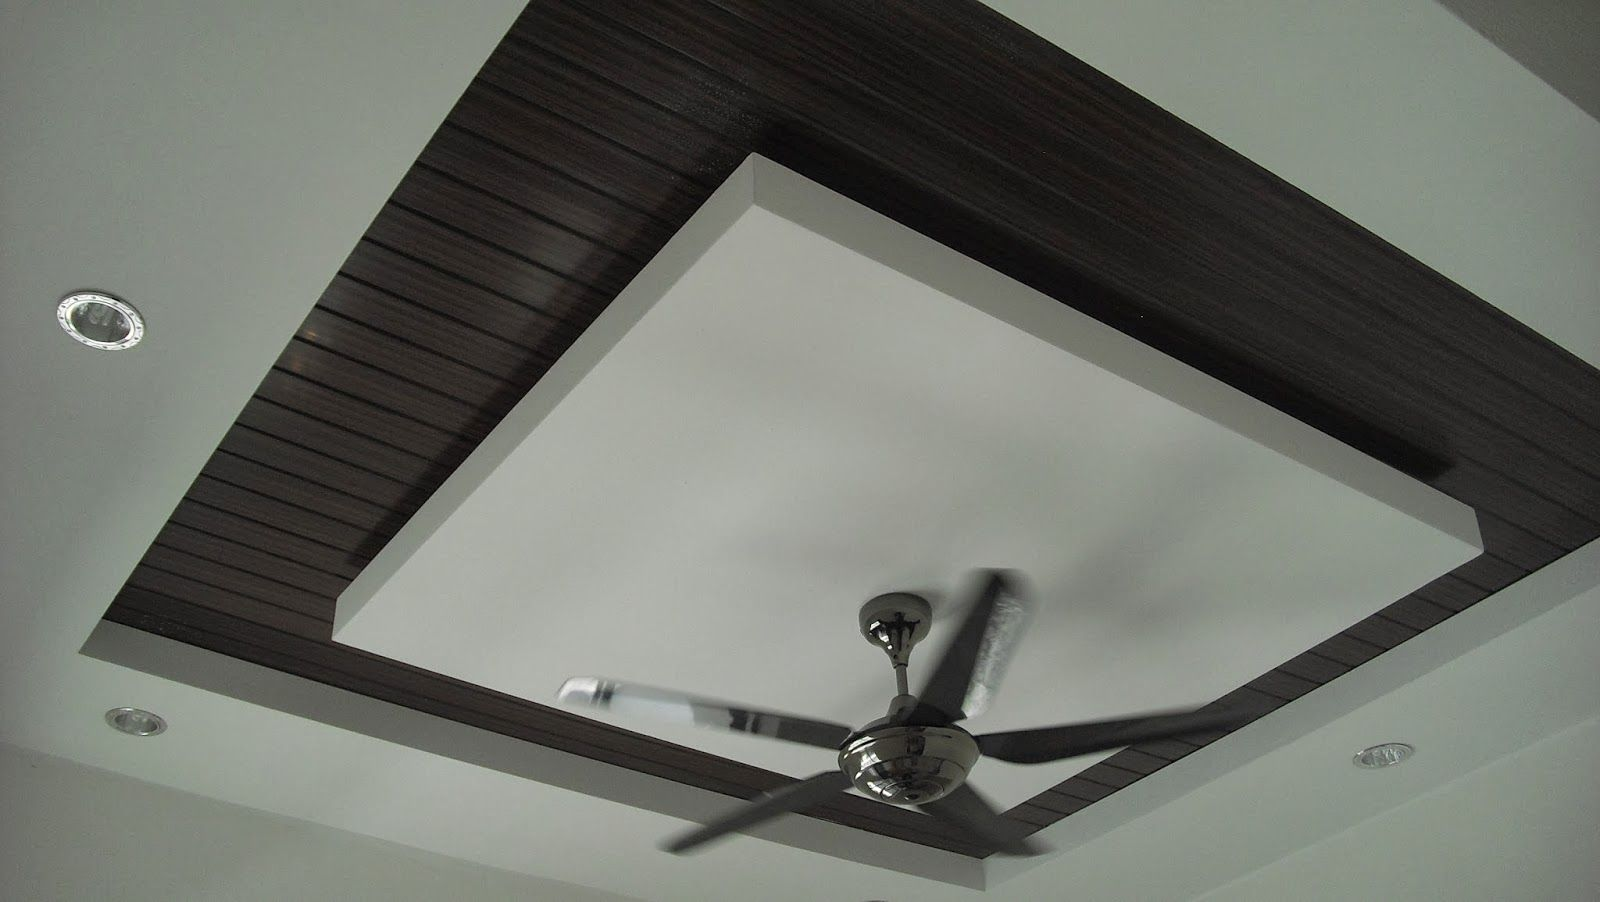 plaster ceiling design kayu - Google Search